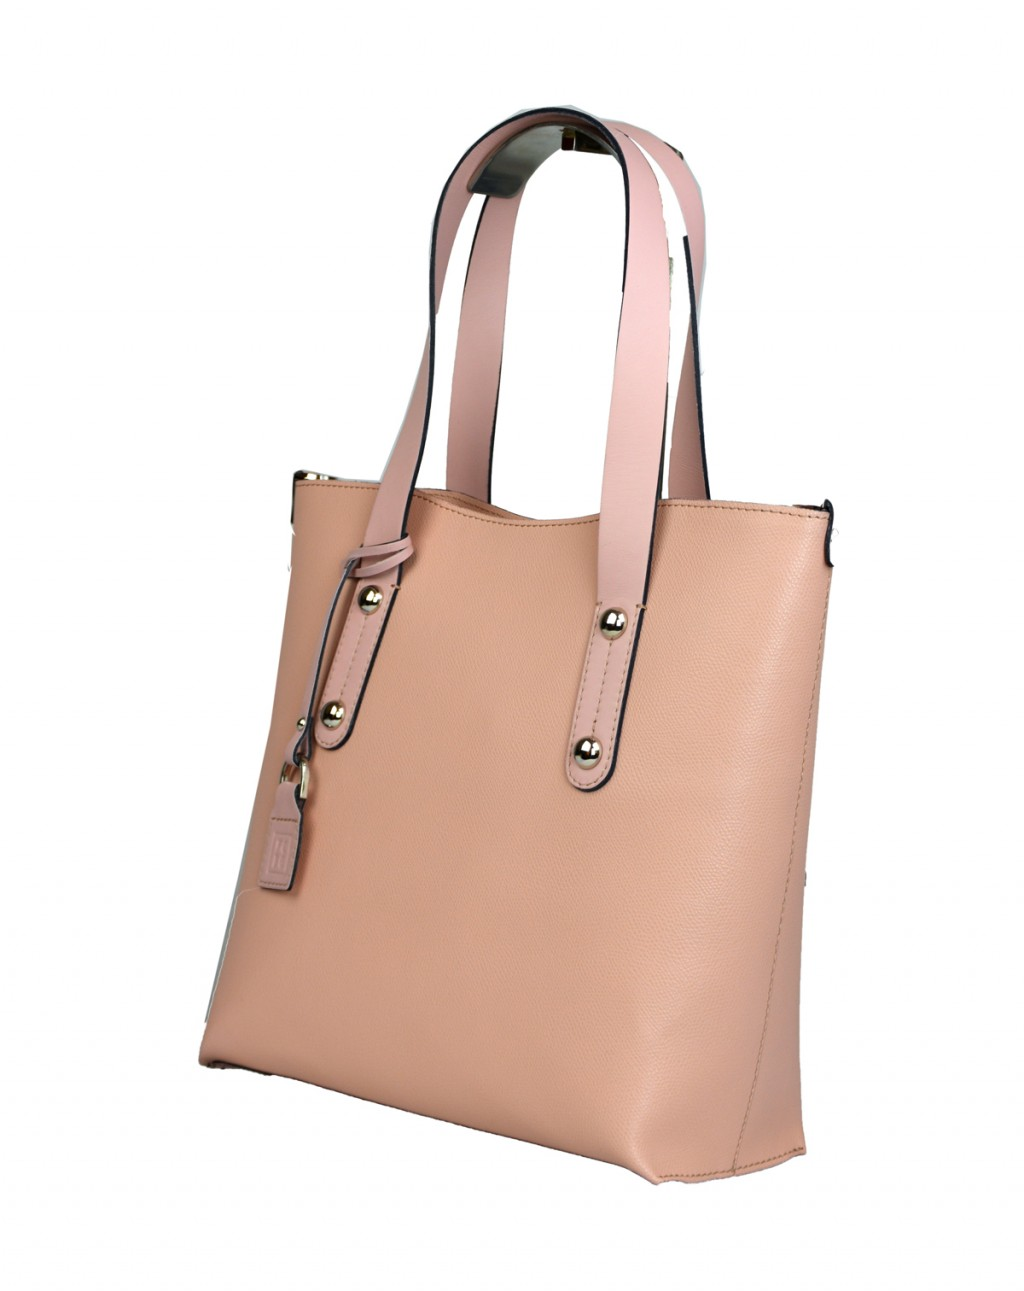 Dámská kožená kabelka FACEBAG IRENE - Růžová